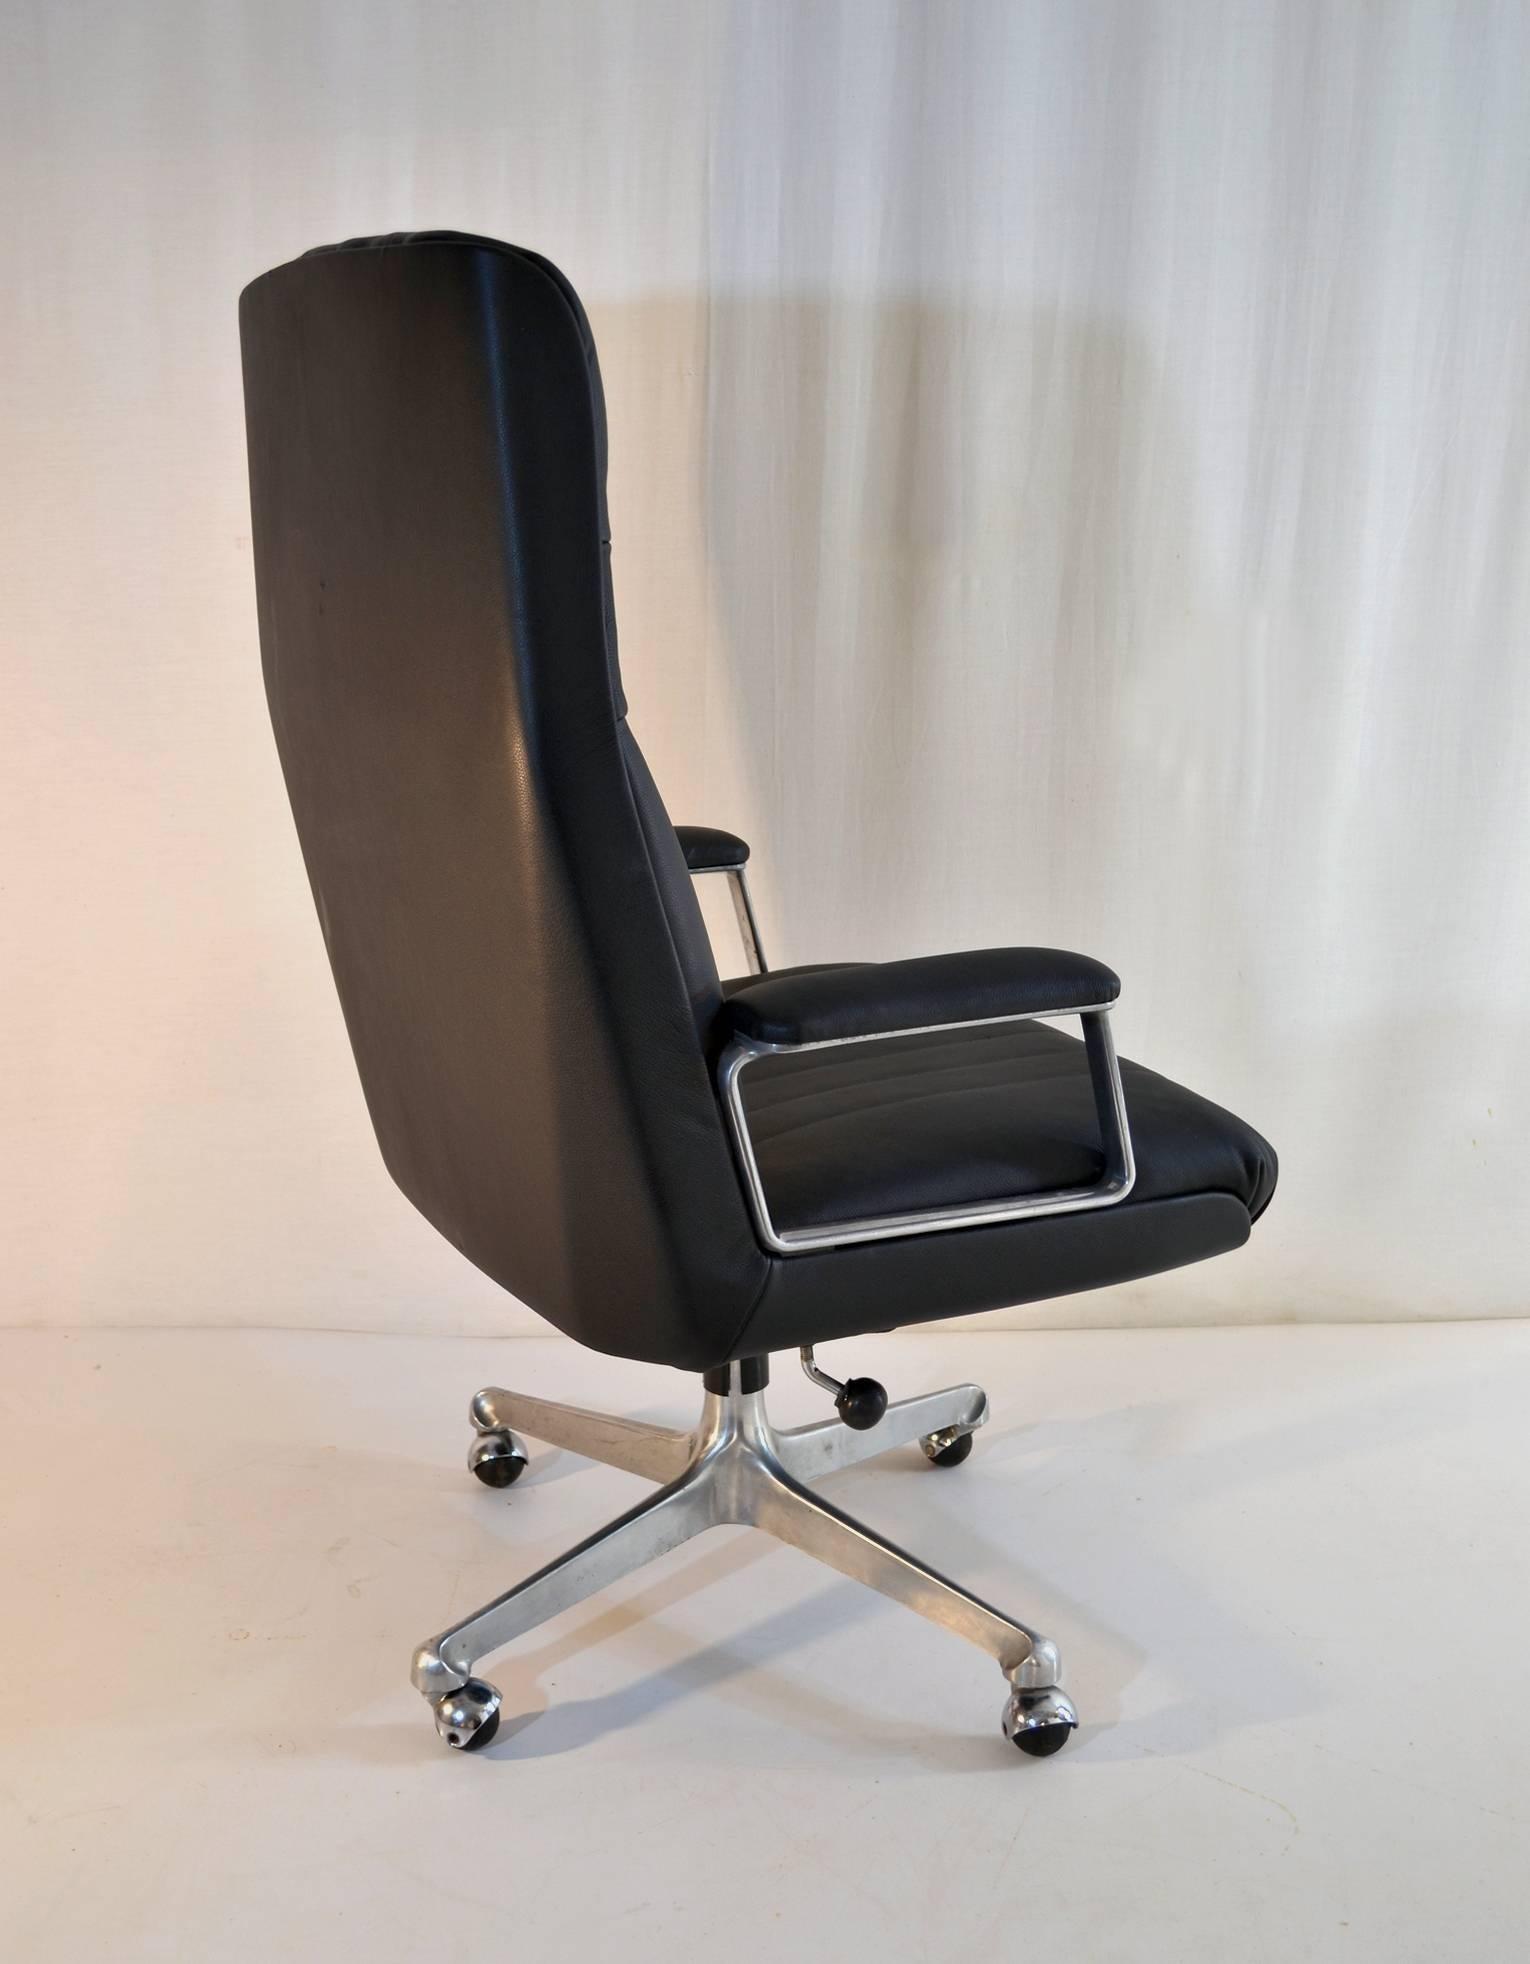 modern executive office chair lazy boy desk p128 by osvaldo borsani for tecno at 1stdibs mid century sale